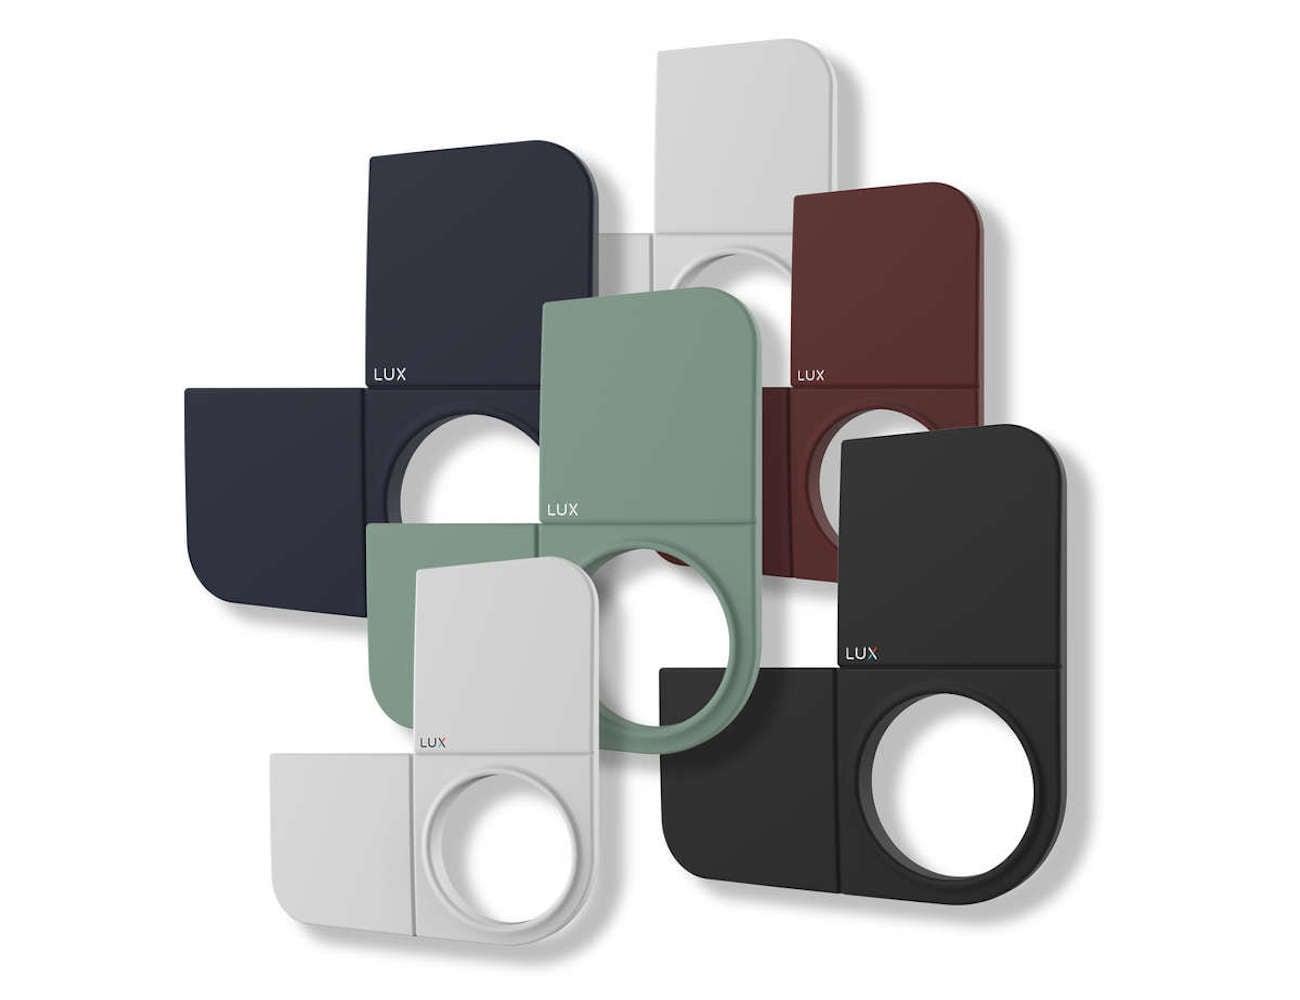 Lux Kono Smart Home Thermostat 187 Gadget Flow